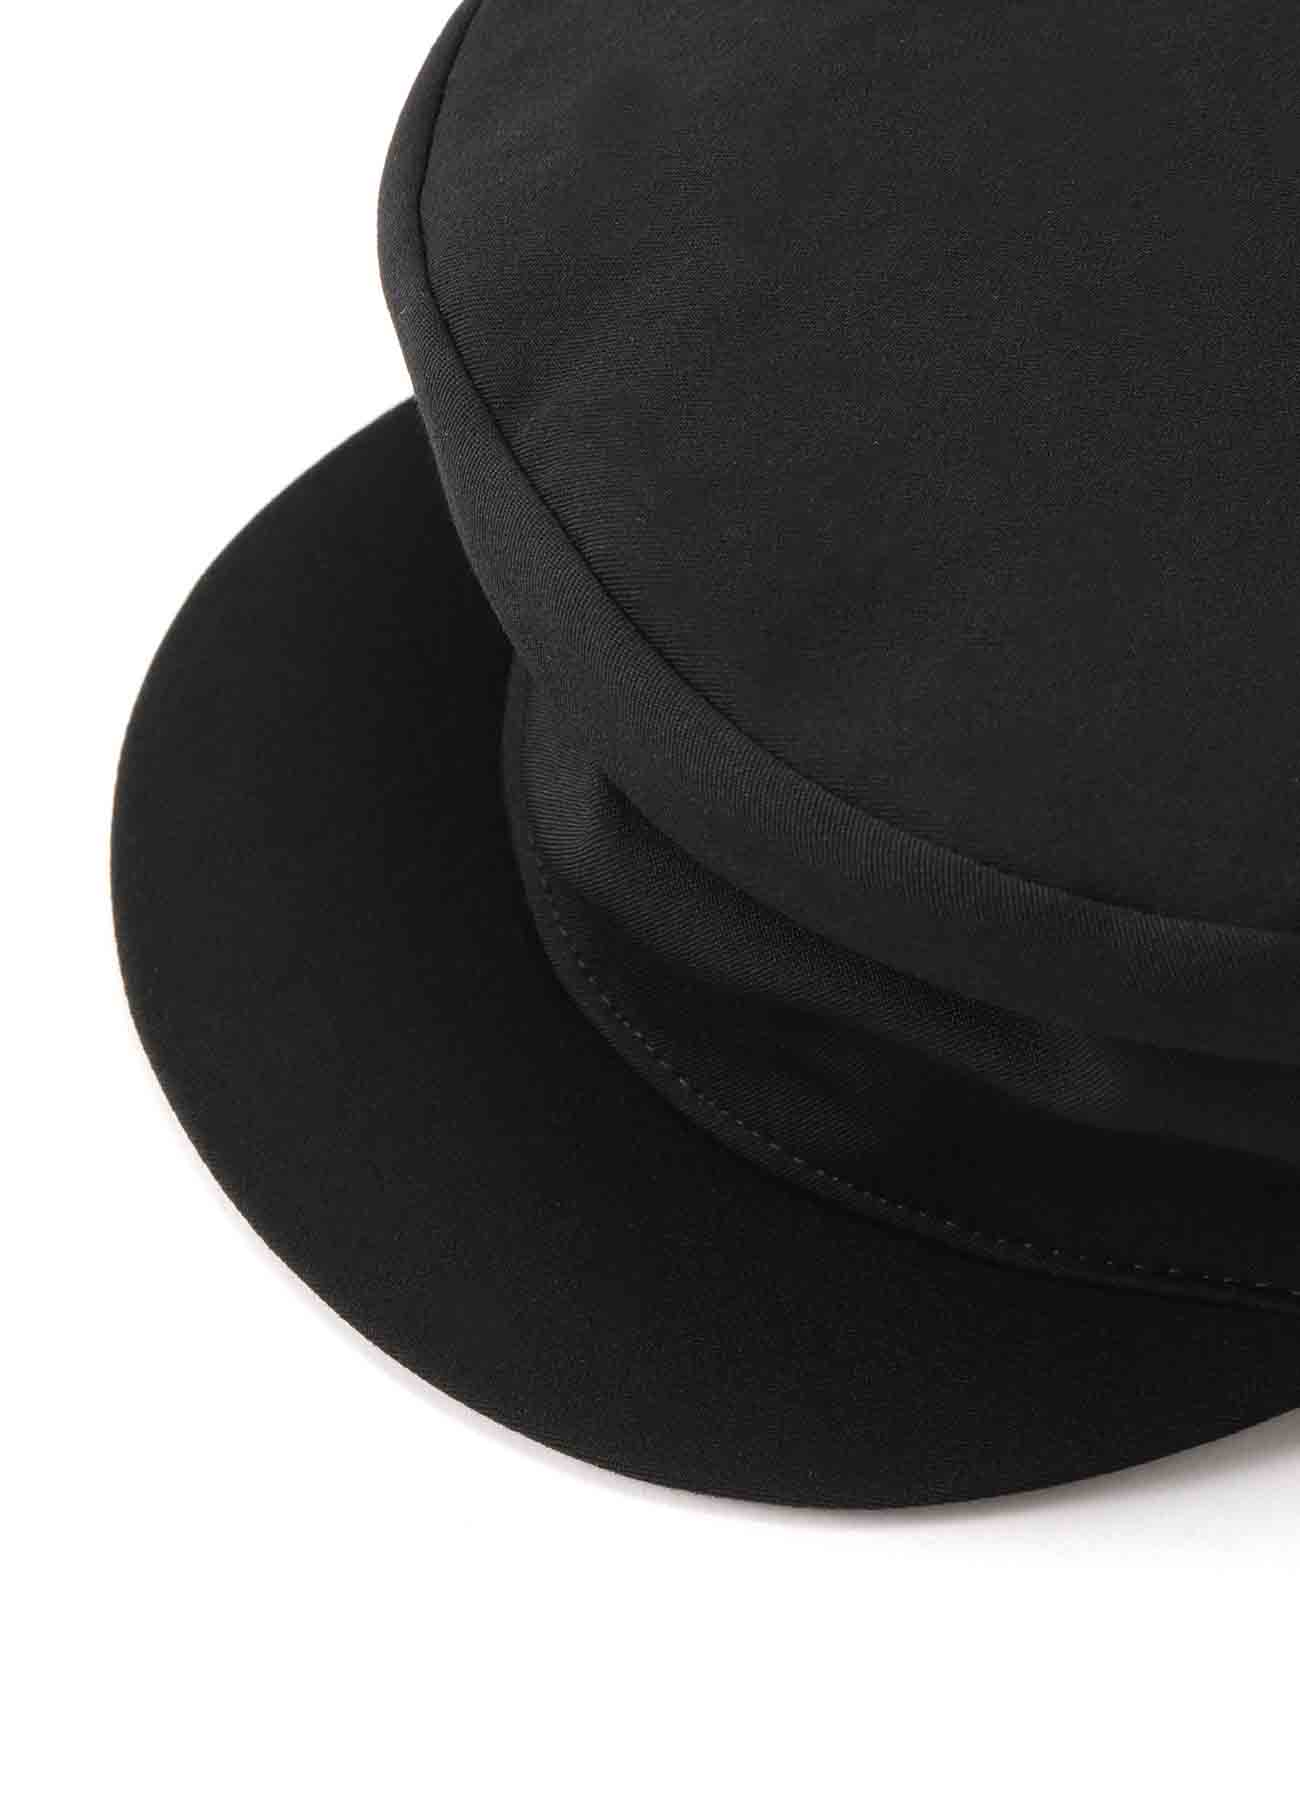 GABARDINE MILITARY CAP